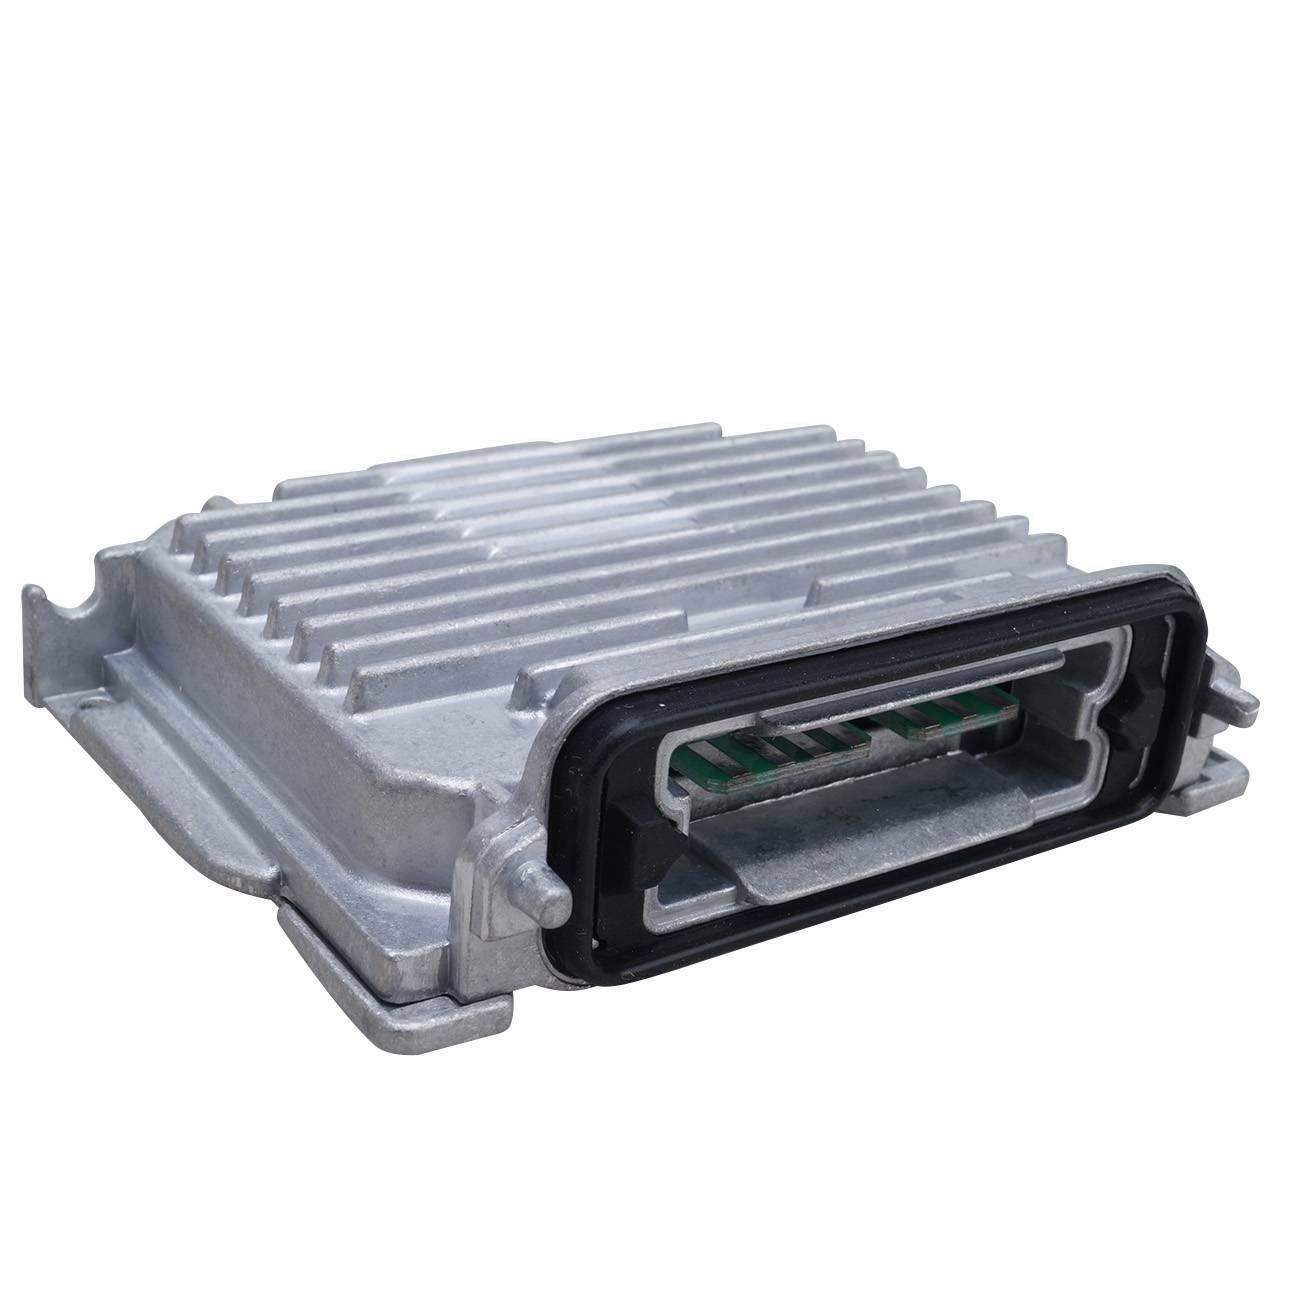 Reator Xenon Oem 63117180050 A09